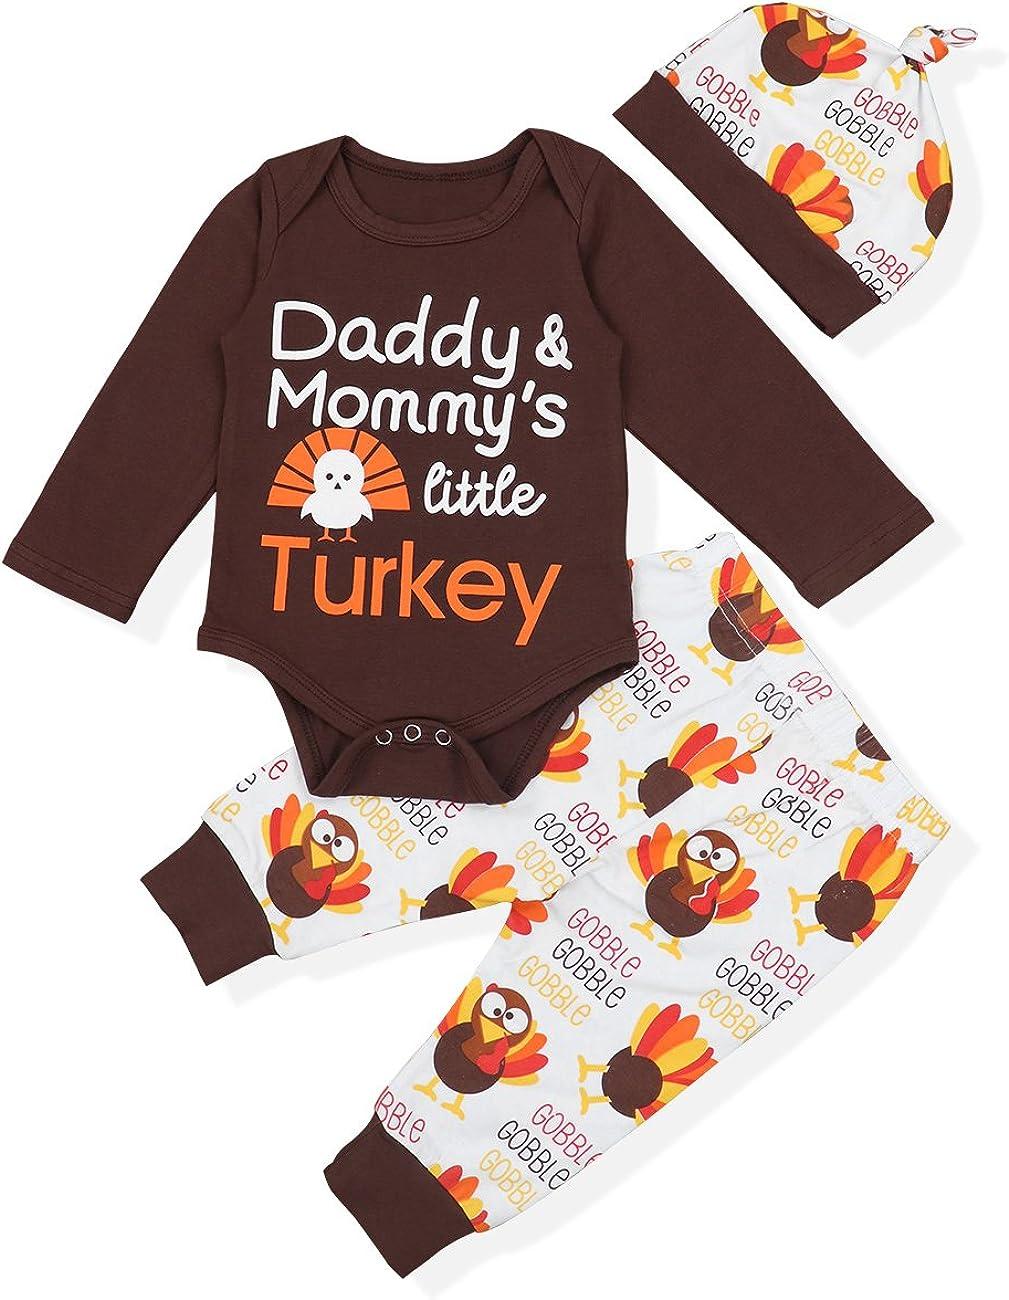 Thanksgiving Bow Thanksgiving Leg Warmers Thanksgiving Sparkle Outfit Baby Thanksgiving Outfit Turkey Outfit First Thanksgiving Outfit